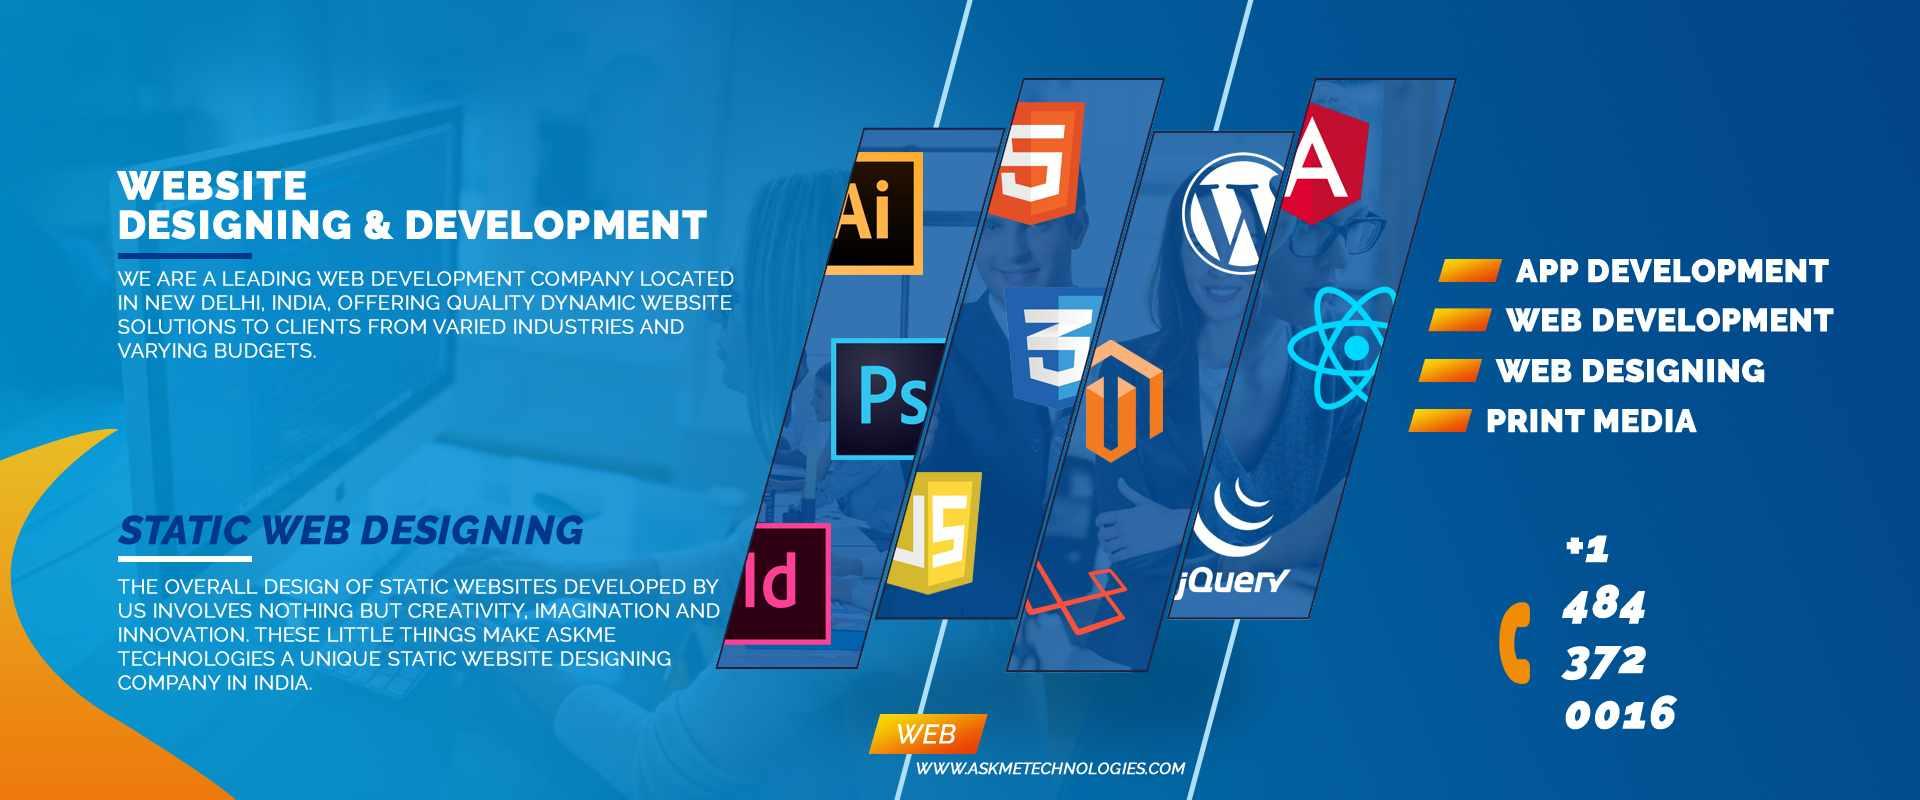 Website Design & Web Development Company in India - Askme Technologies